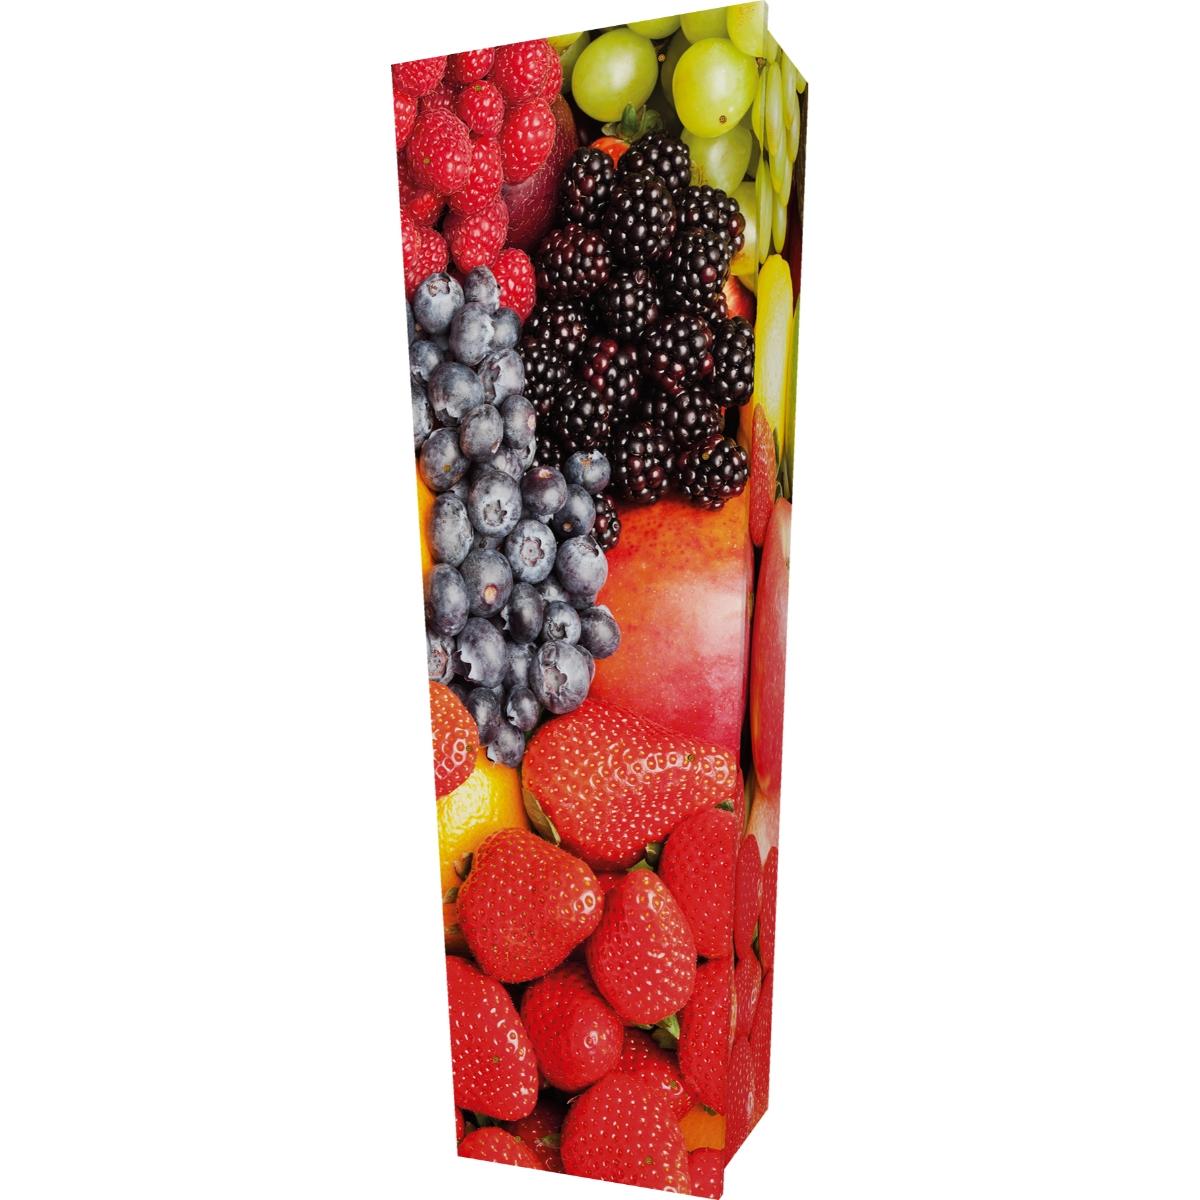 Fruit Coffin